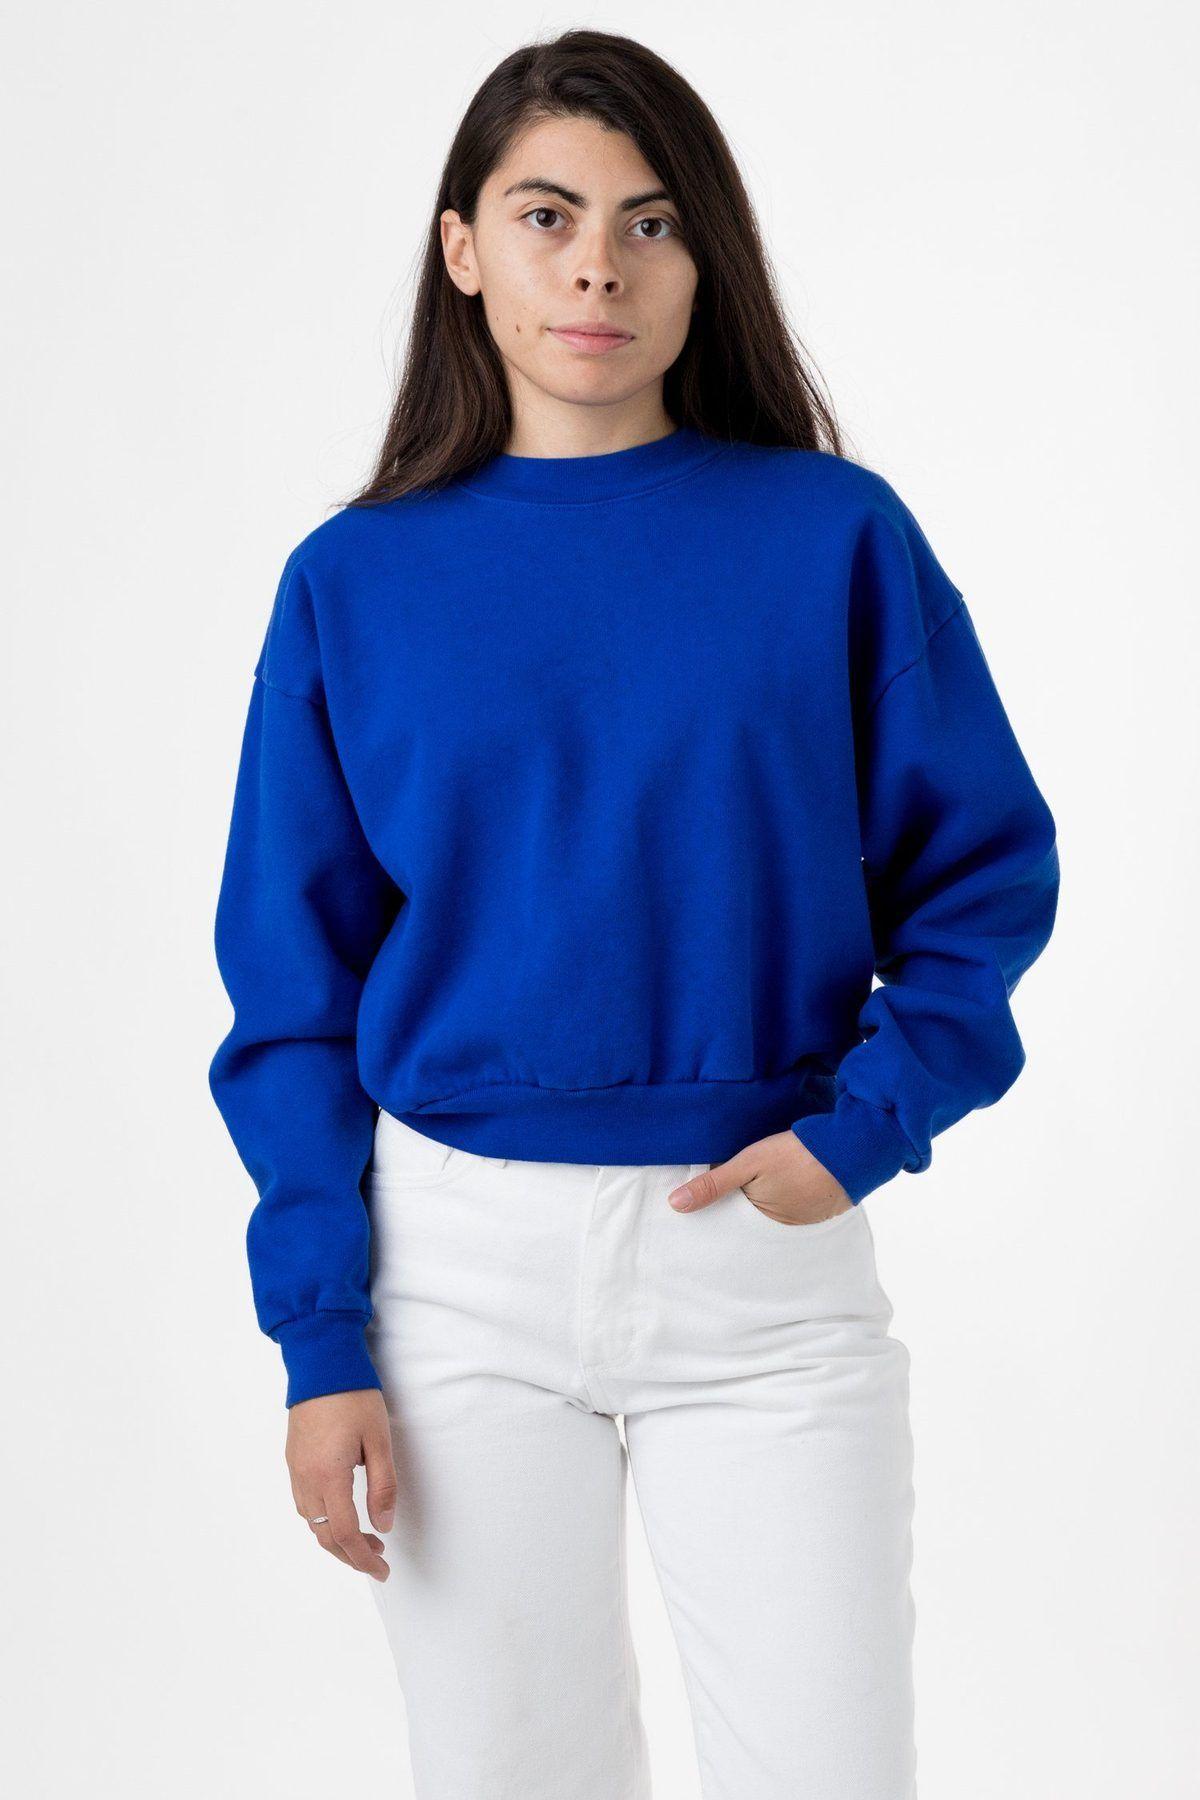 Hf06gd 14 Oz Garment Dye Heavy Fleece Cropped Mock Neck Pullover Garment Dye Sweatshirts Women High Waisted Pants